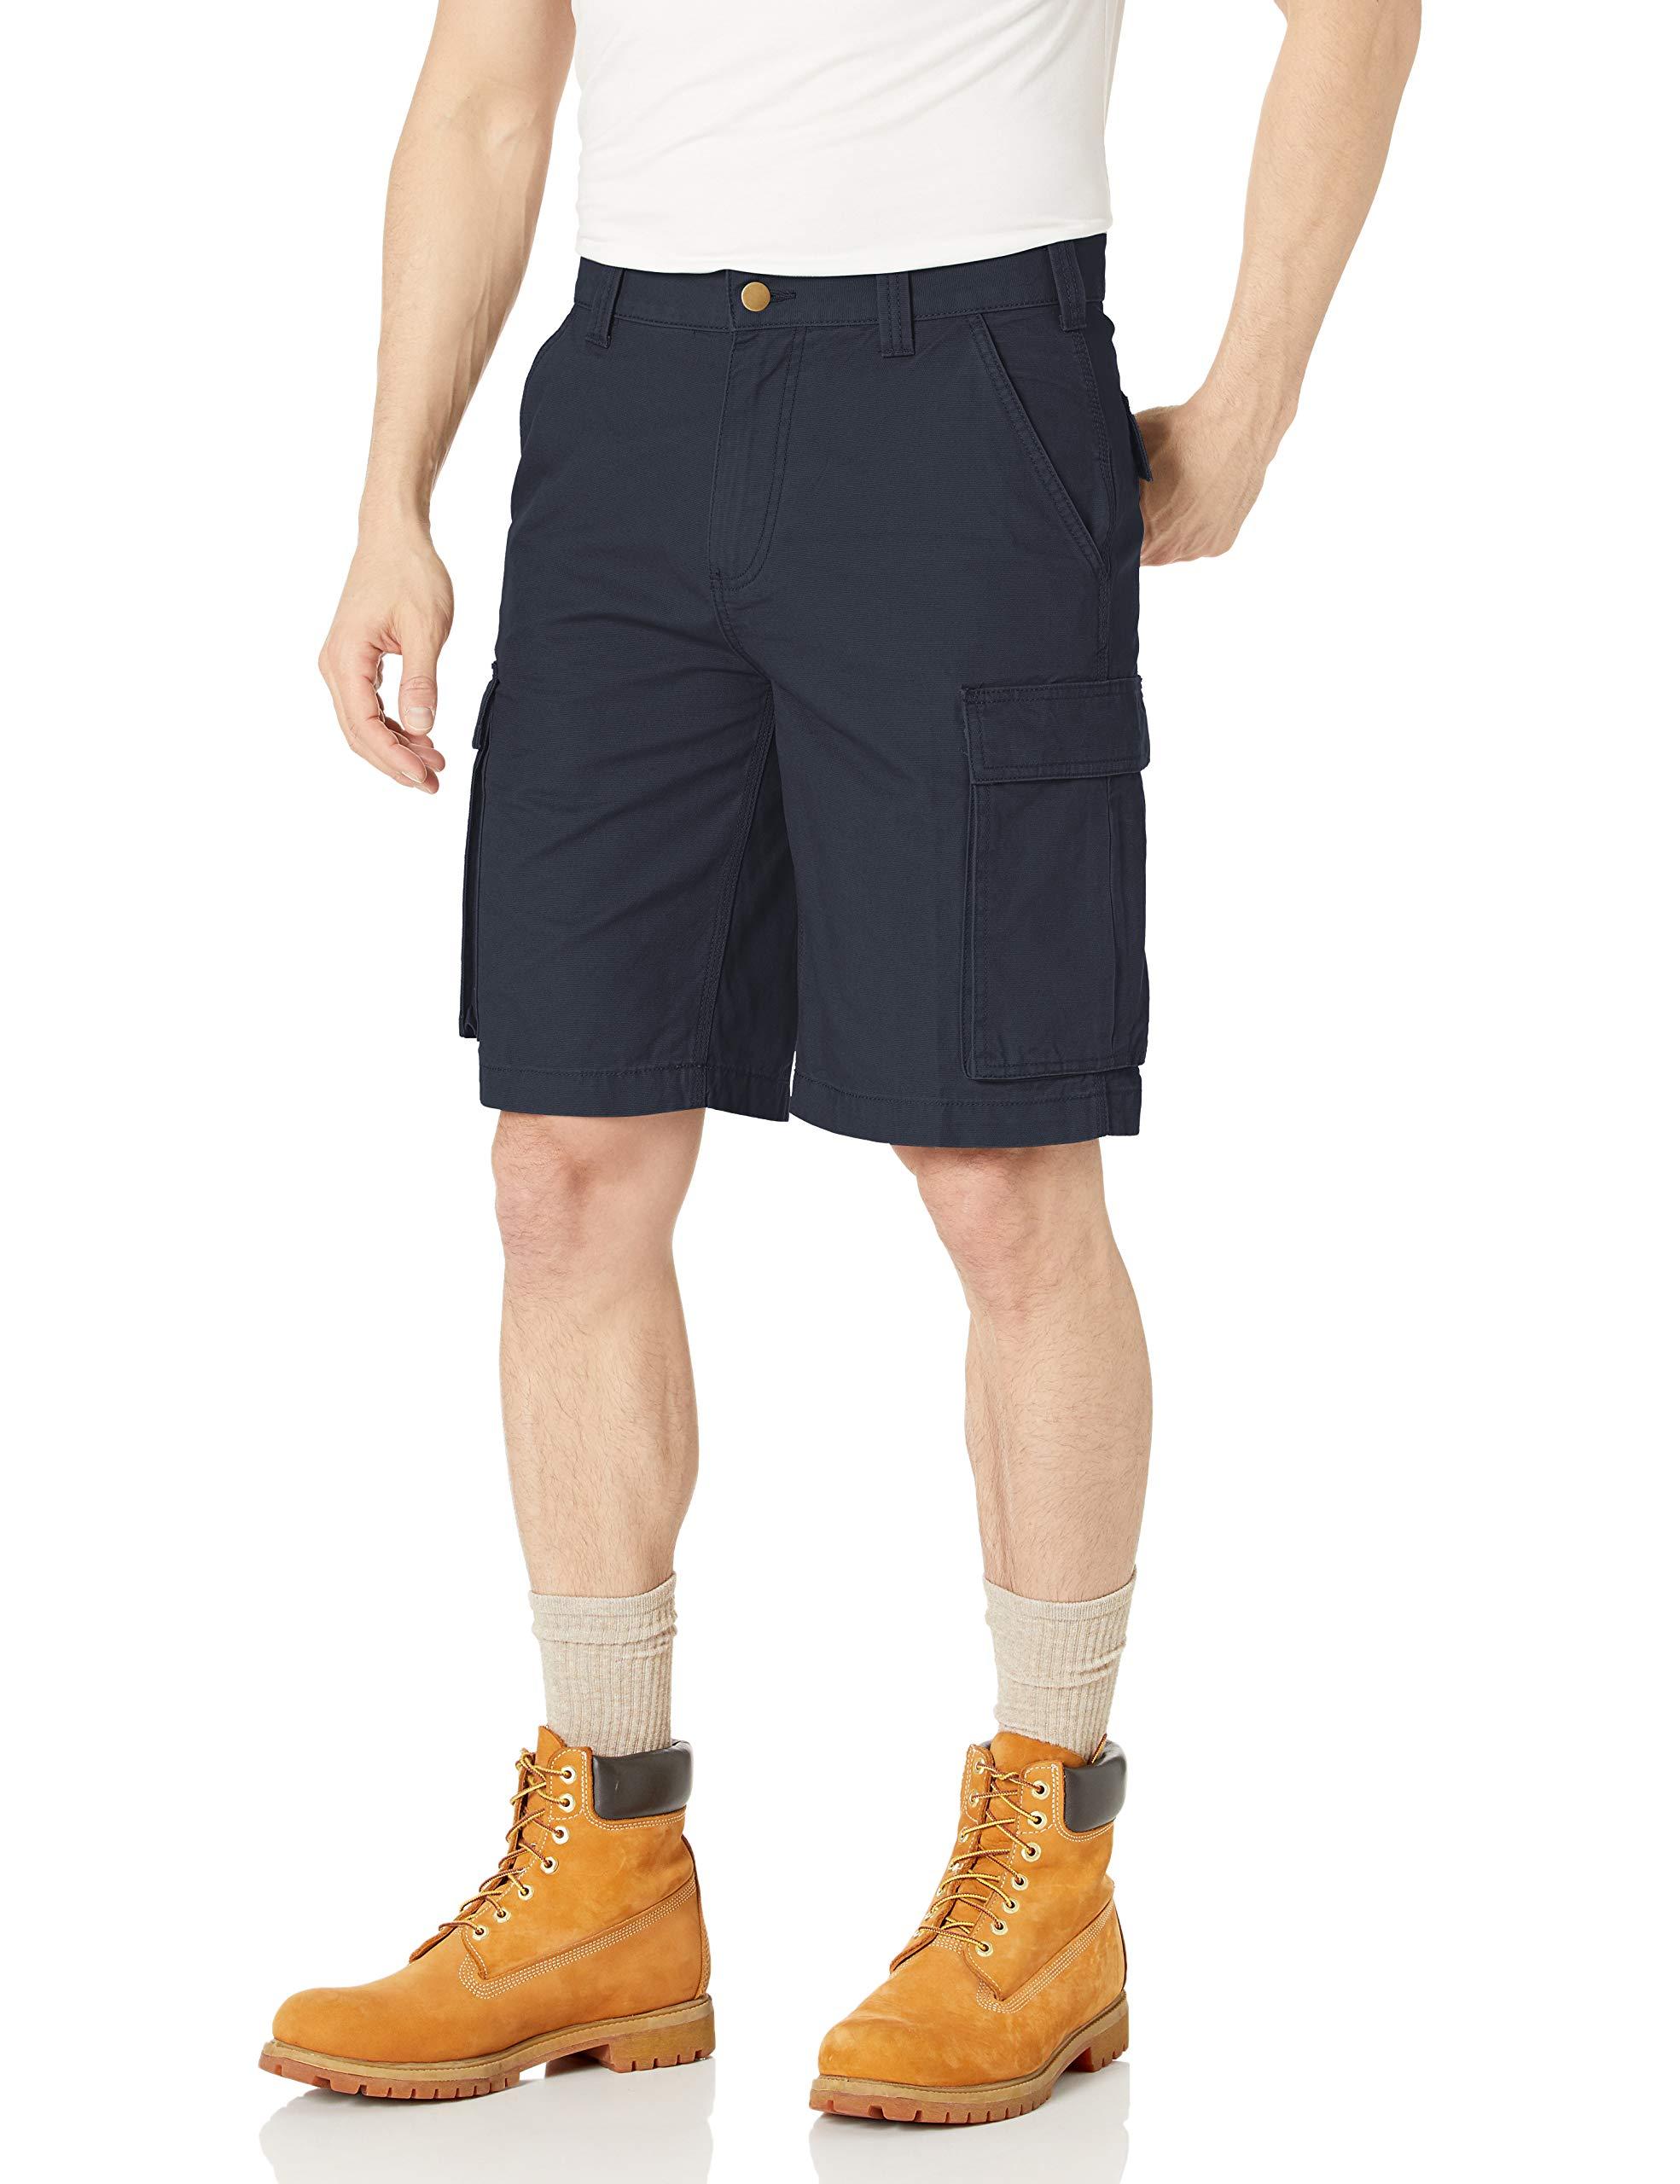 "Amazon Essentials Men's Workwear 11"" Cargo Short"